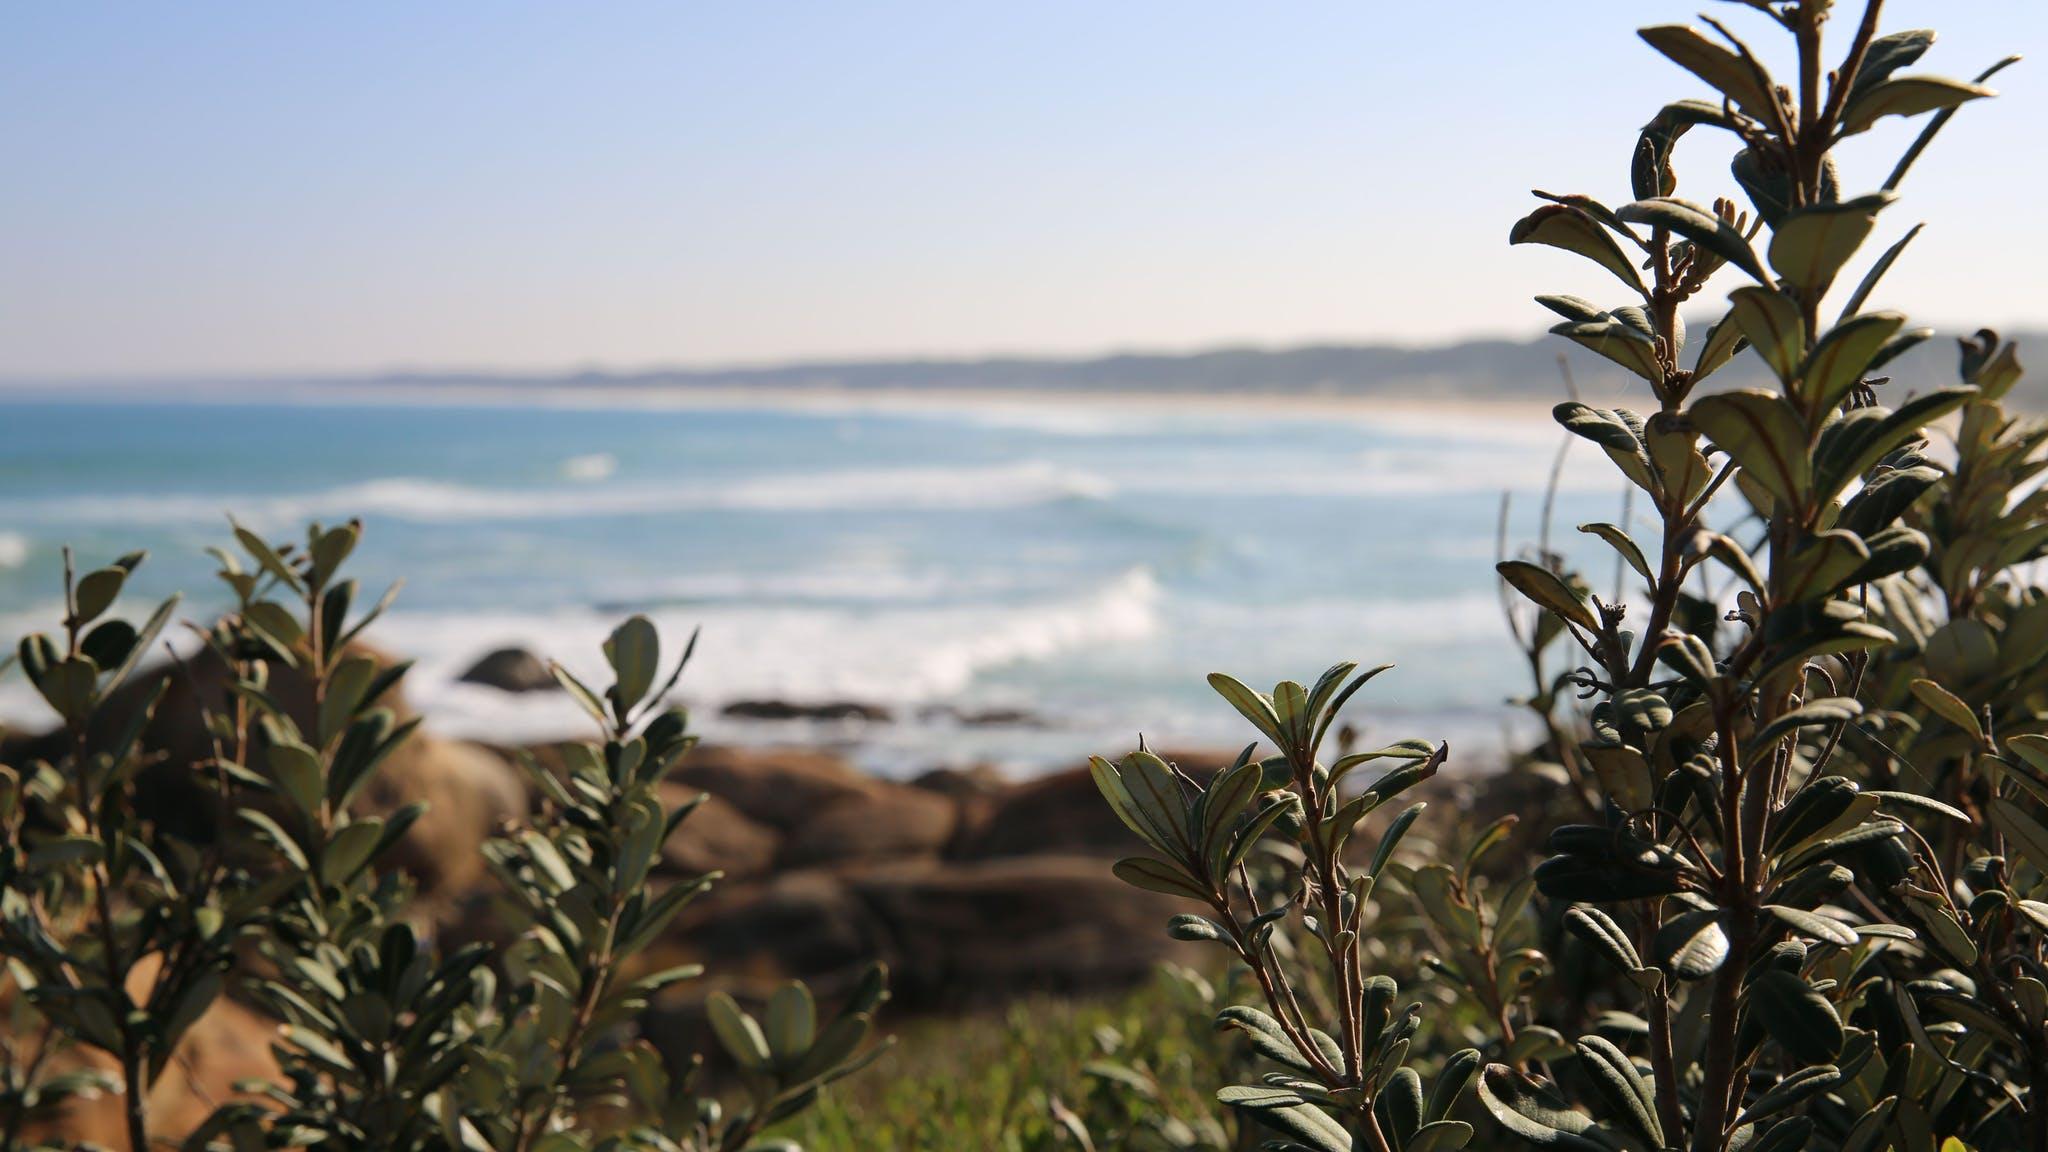 Cape Conran Coastal Park, Attraction, Gippsland, Victoria